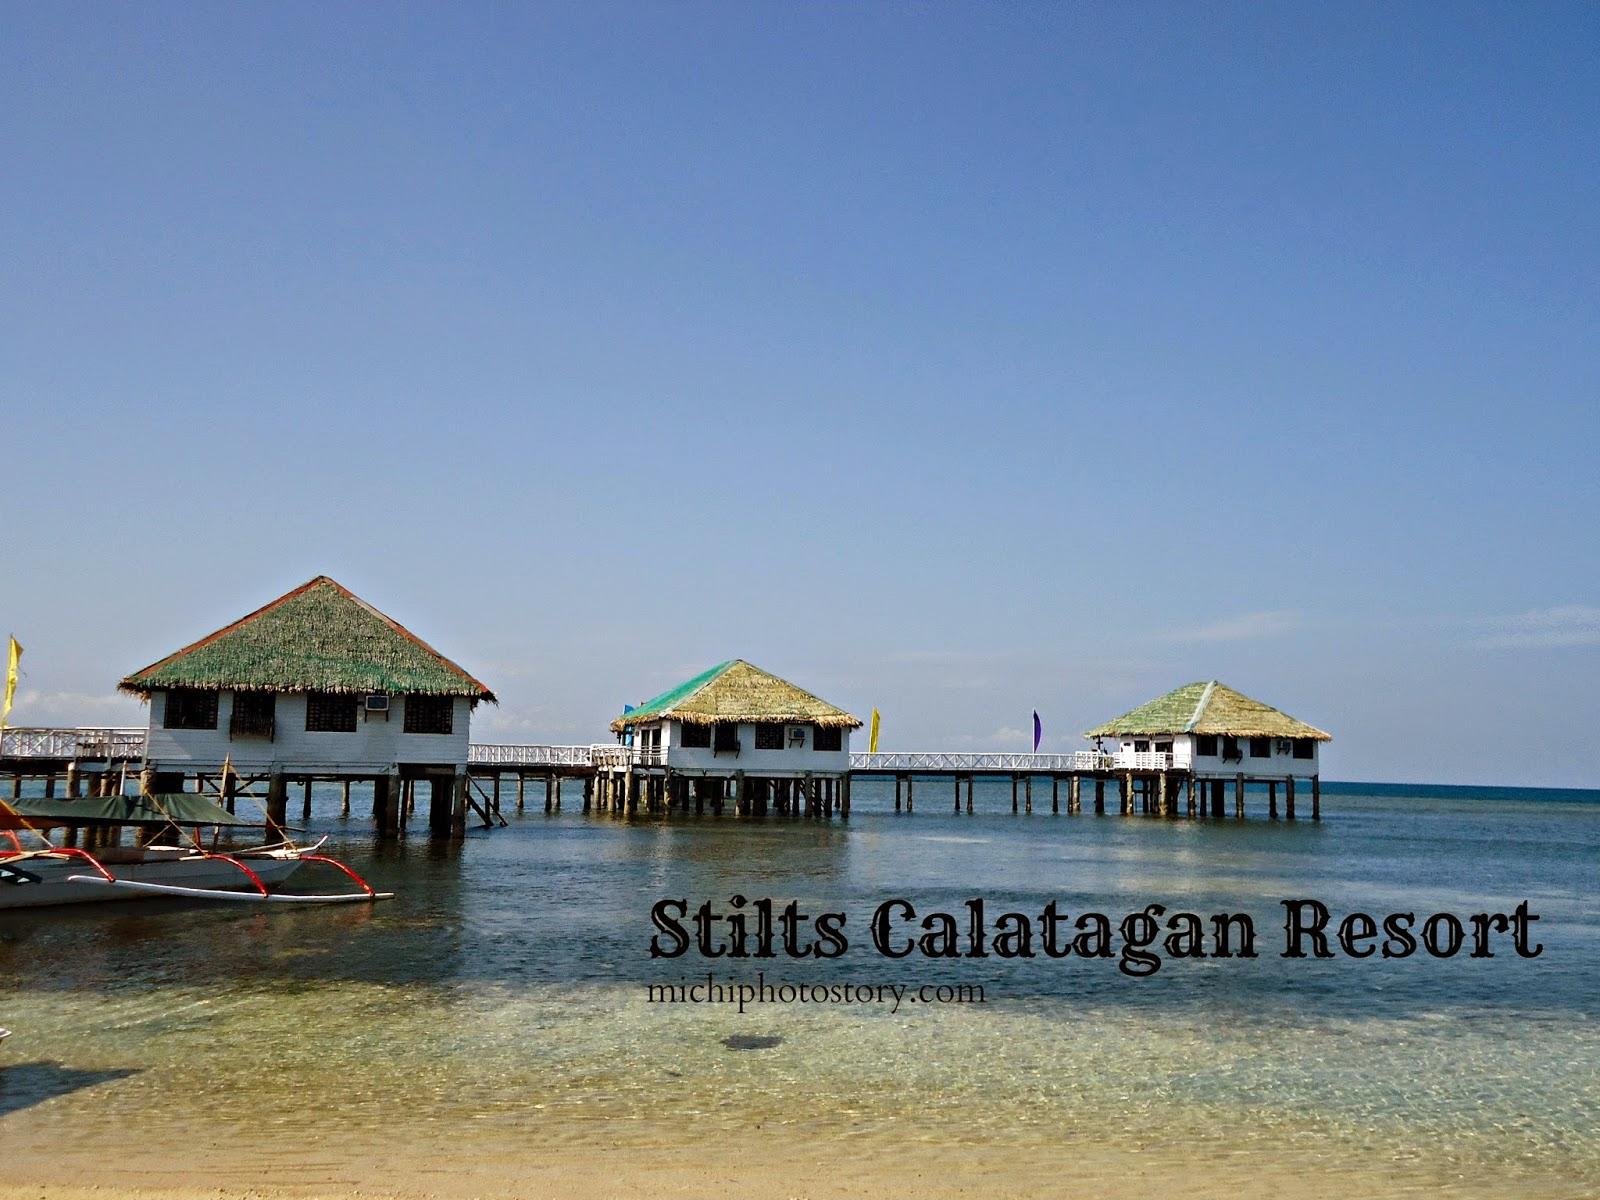 Michi Photostory Soak Up The Sun At Batangas Resort